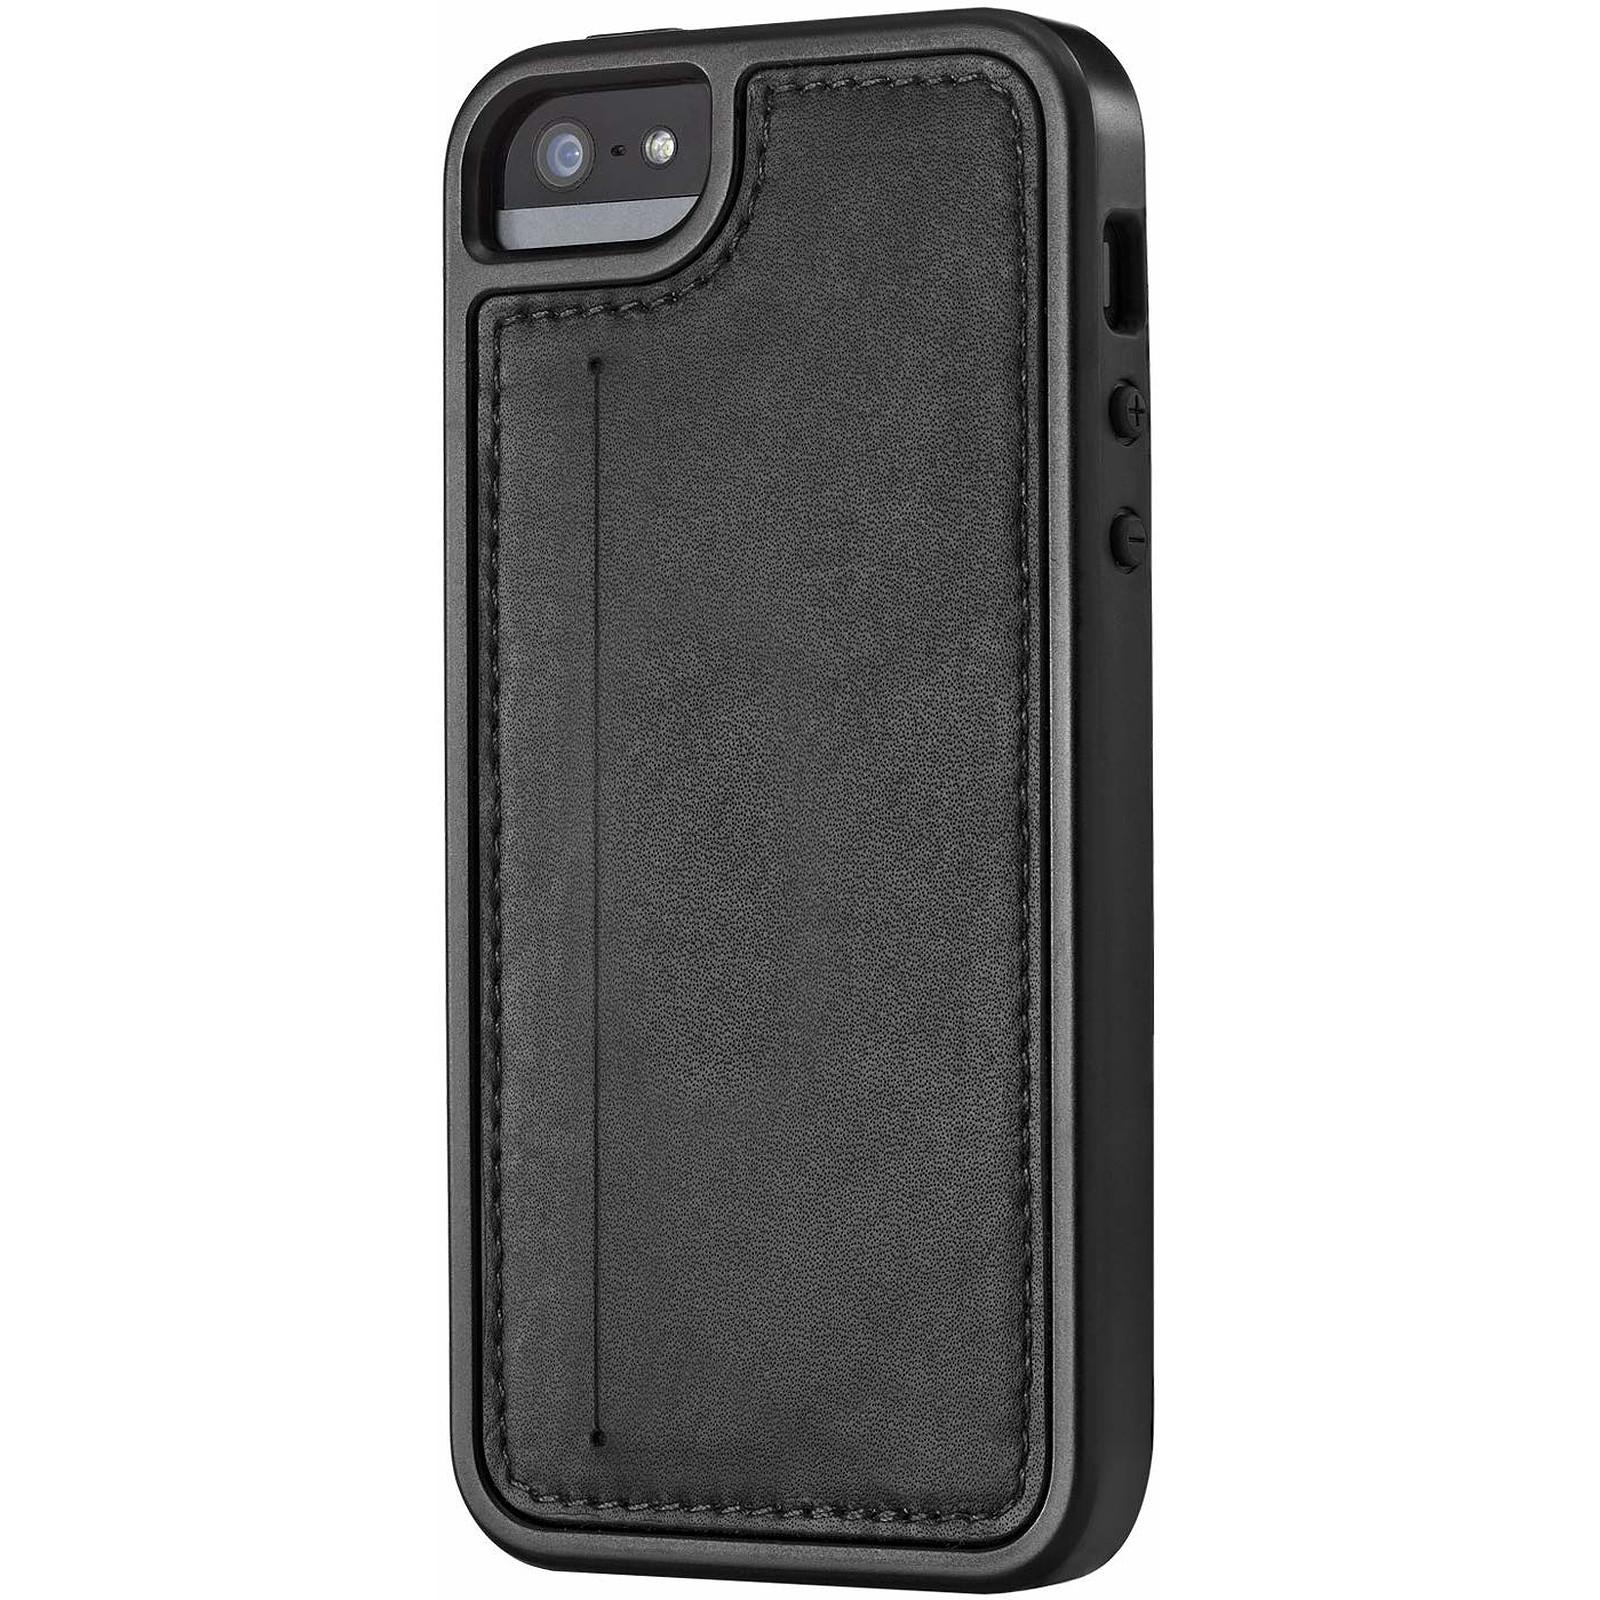 SKECH Coque KAMEO LEATHER iPhone 5/5S Noir